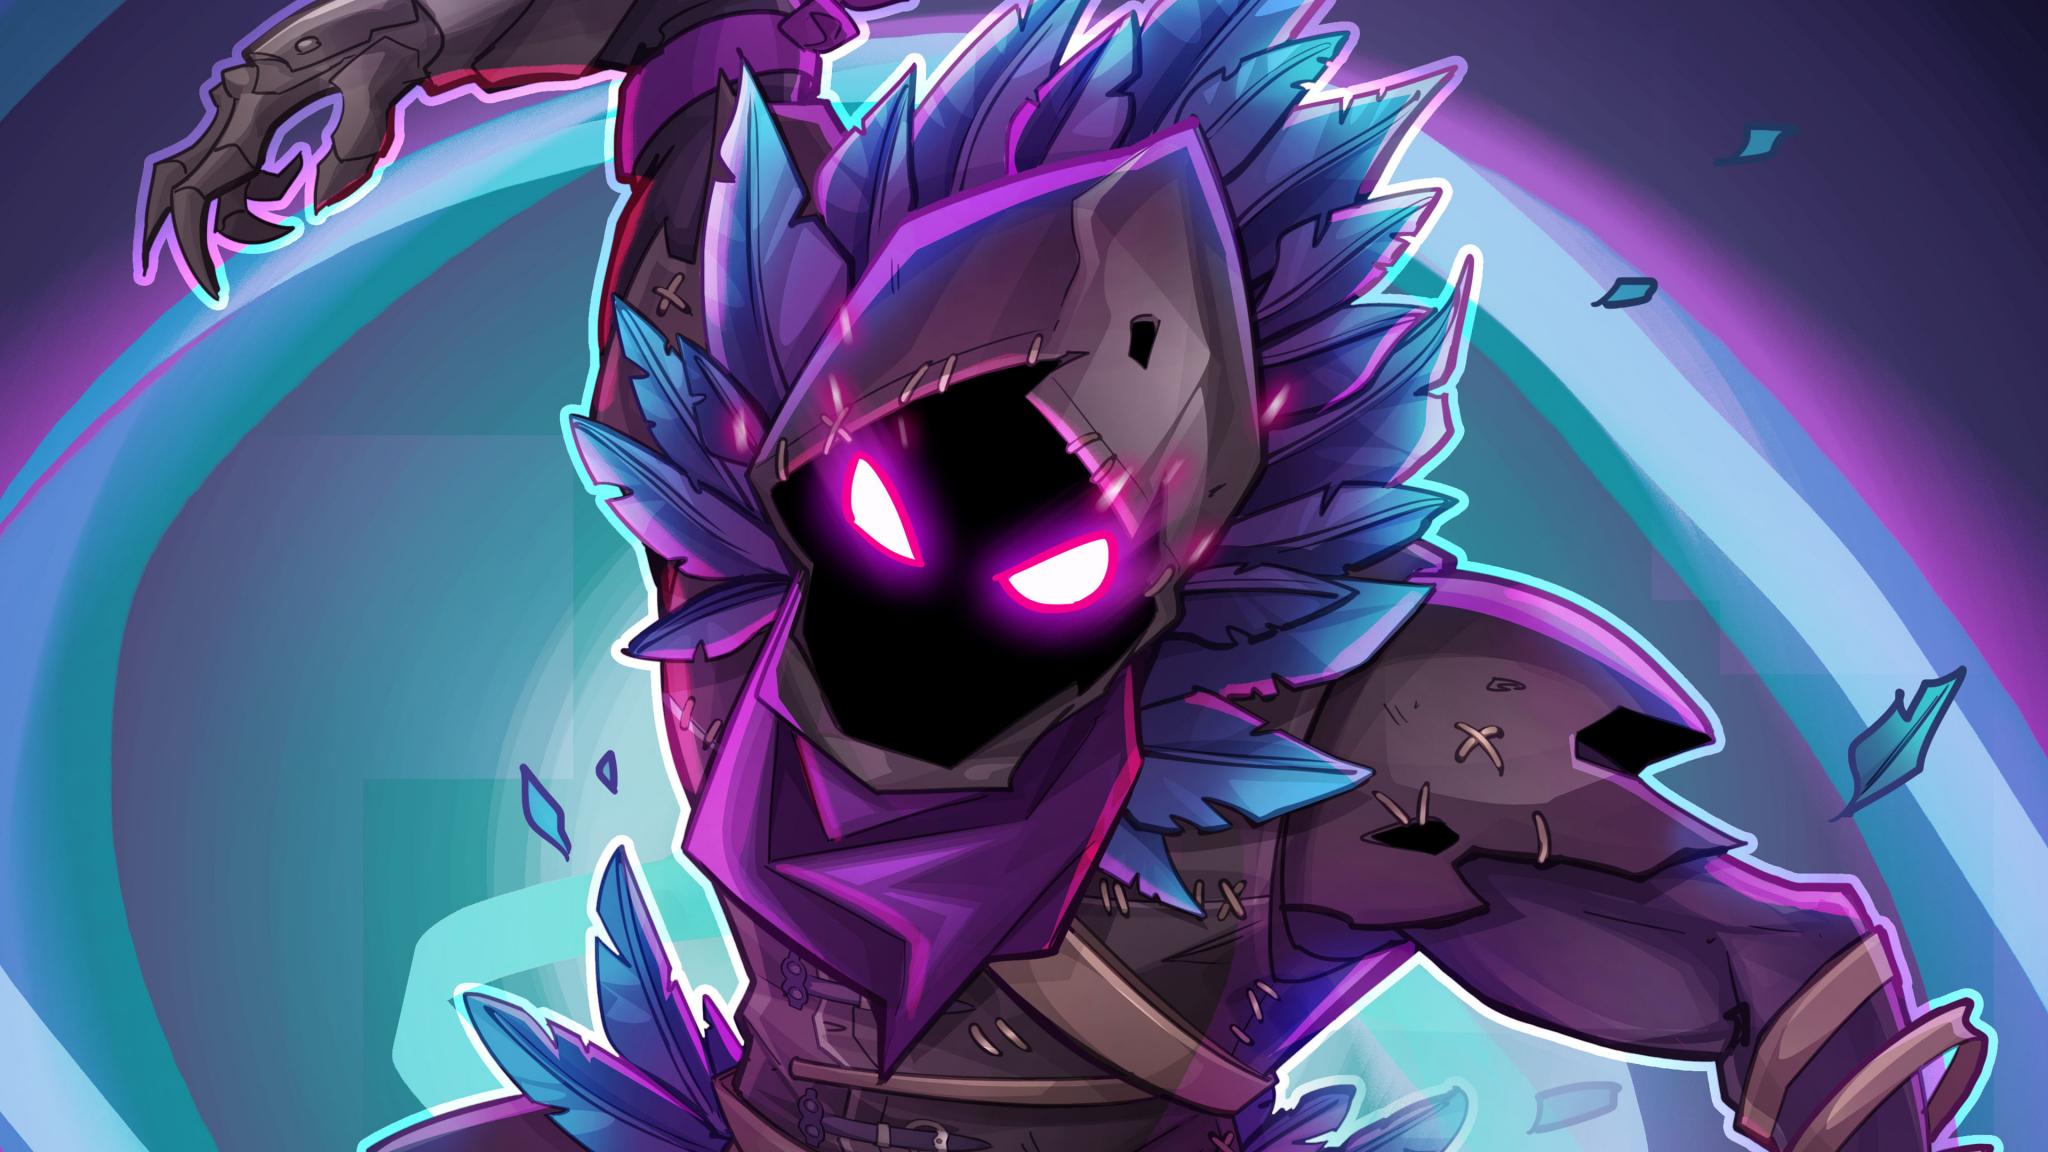 Download 2048x1152 Wallpaper Raven Fortnite Battle Royale Creature